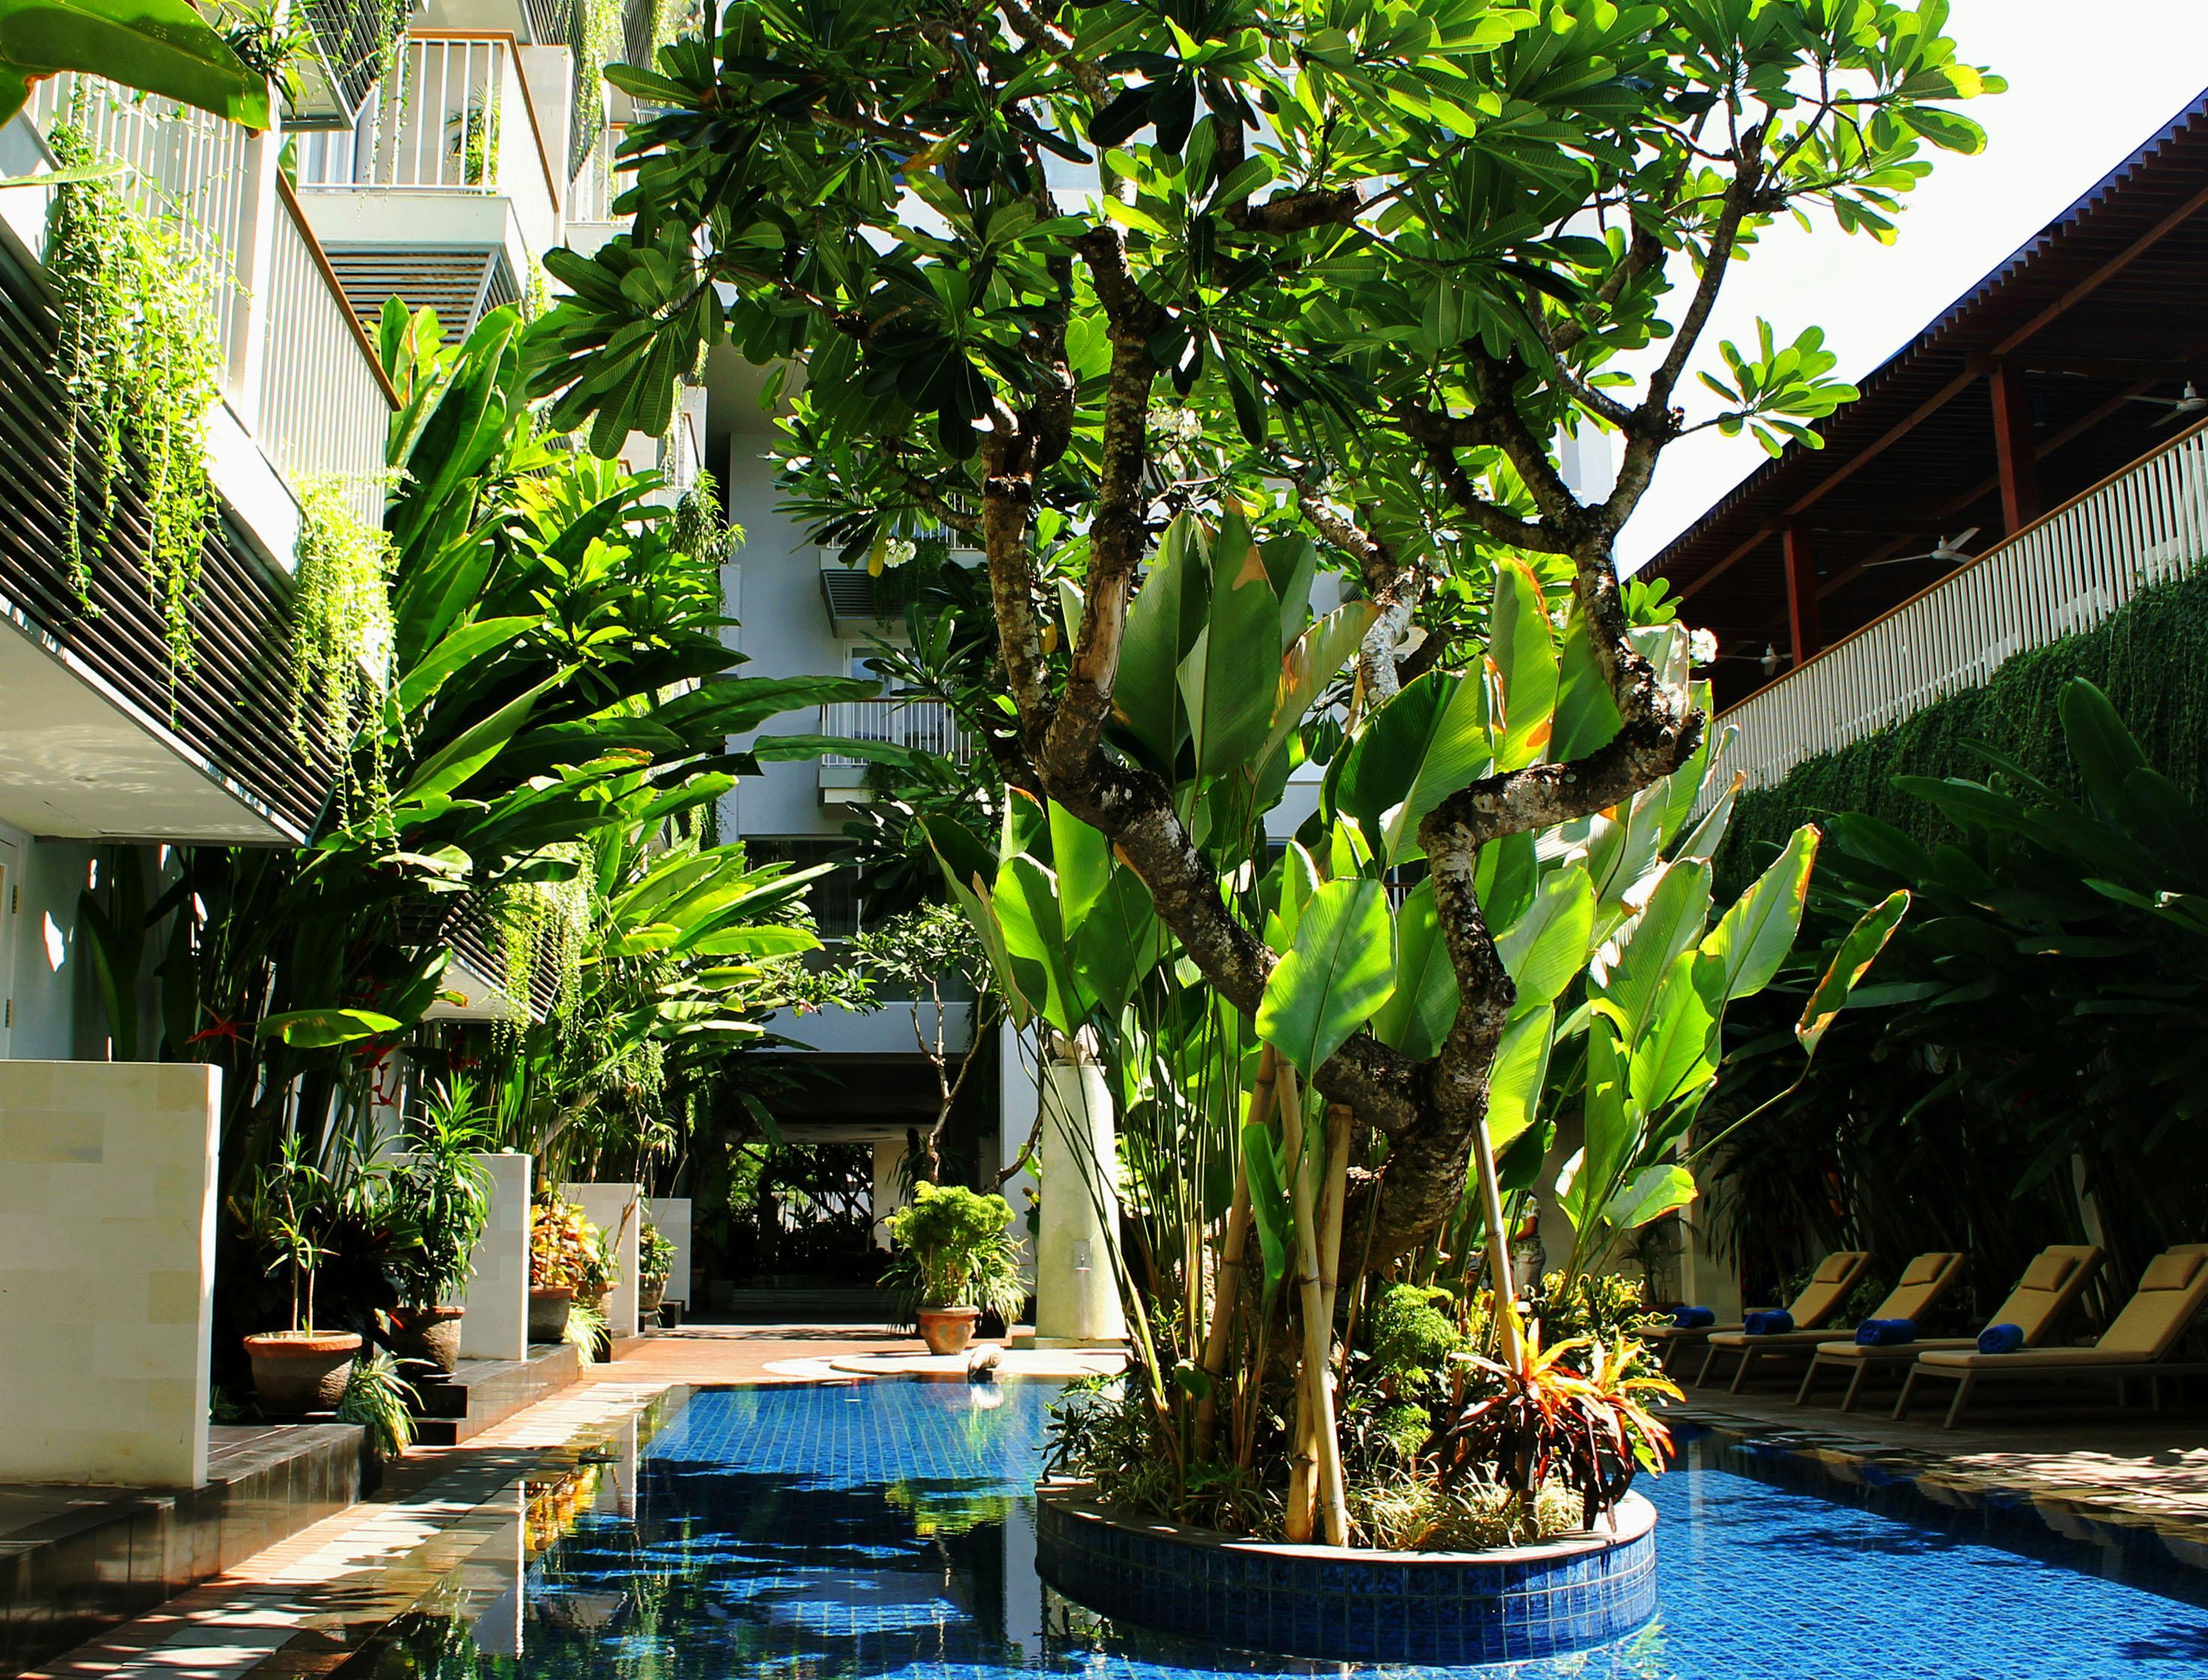 EDEN Hotel Kuta Bali - Managed by Tauzia